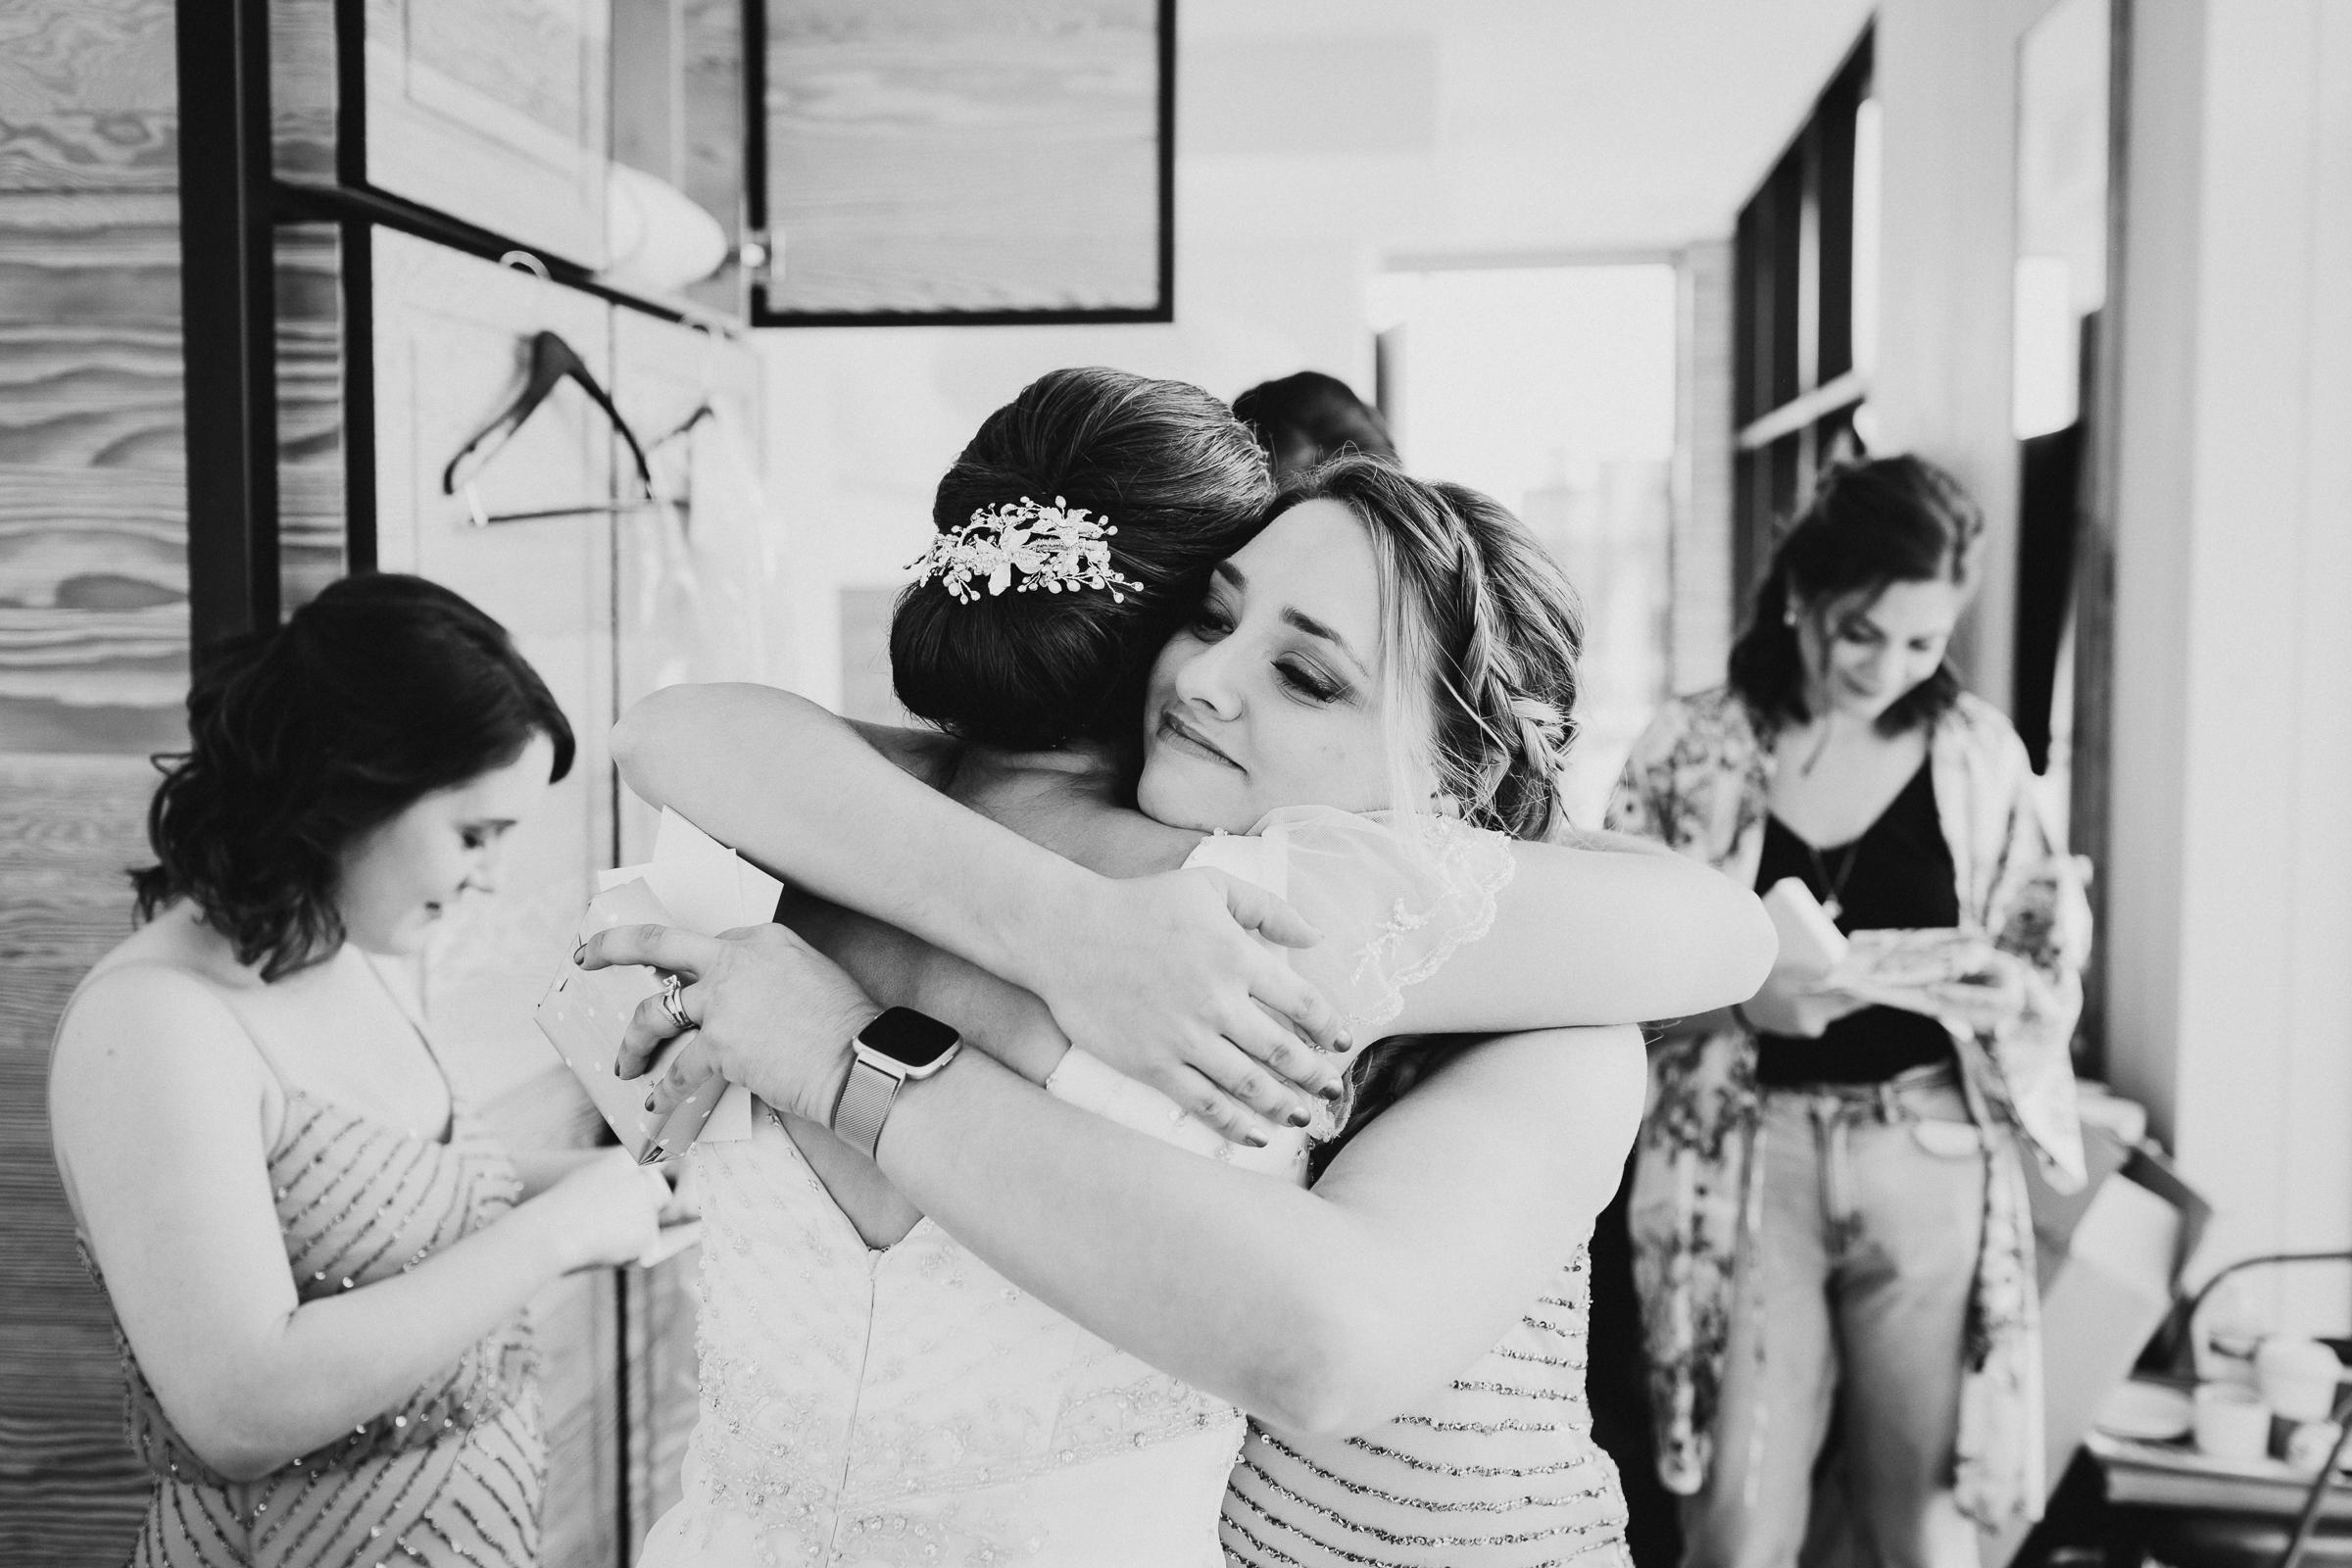 Brooklyn-Winery-NYC-Editorial-Documentary-Wedding-Photographer-Gina-Oli-19.jpg